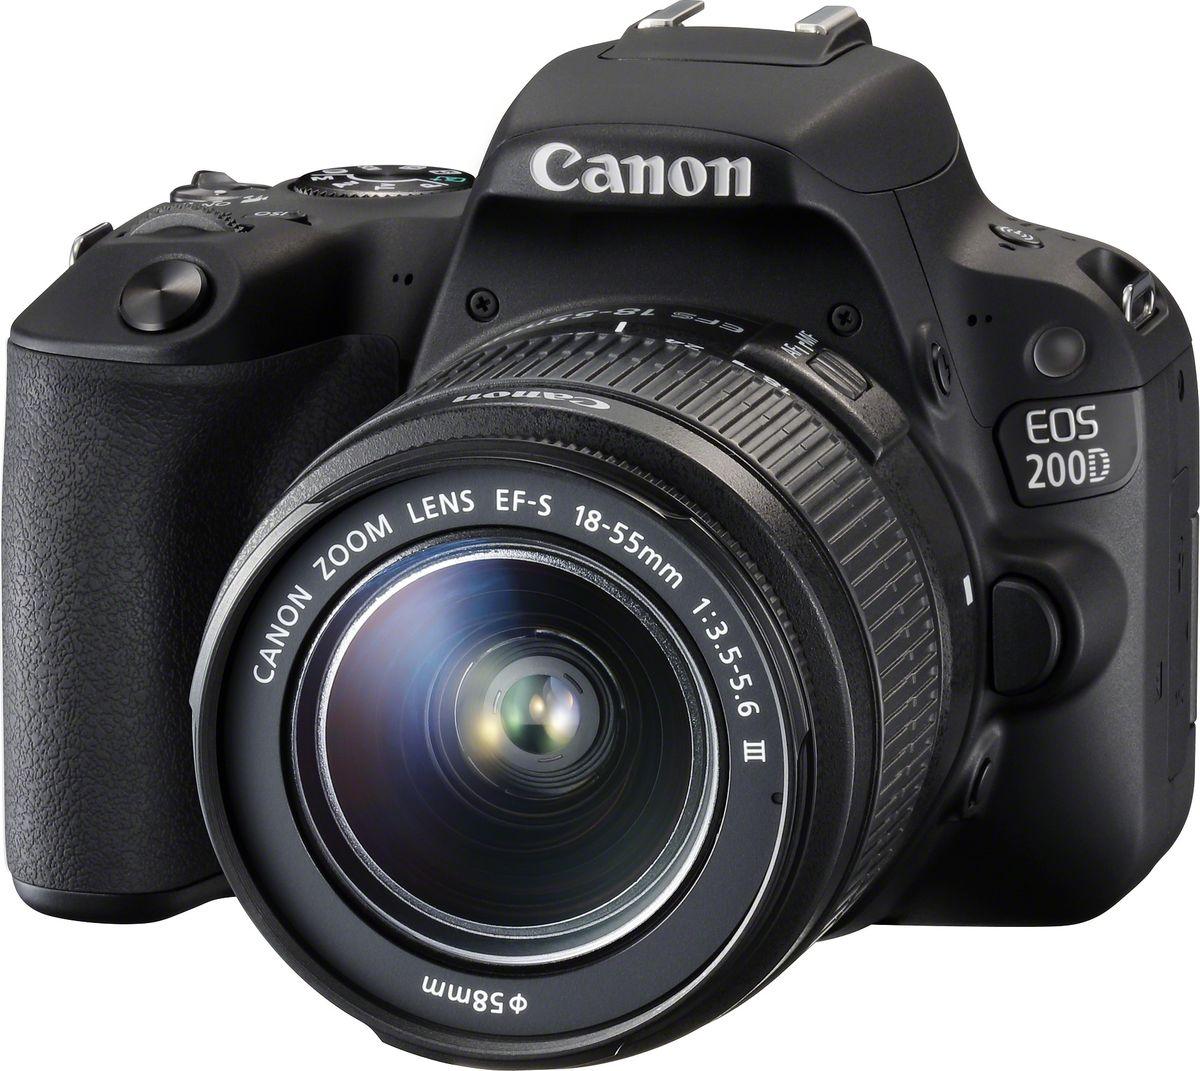 Canon EOS 200D Kit 18-55 DC III, Black цифровая зеркальная фотокамера - Зеркальные фотоаппараты